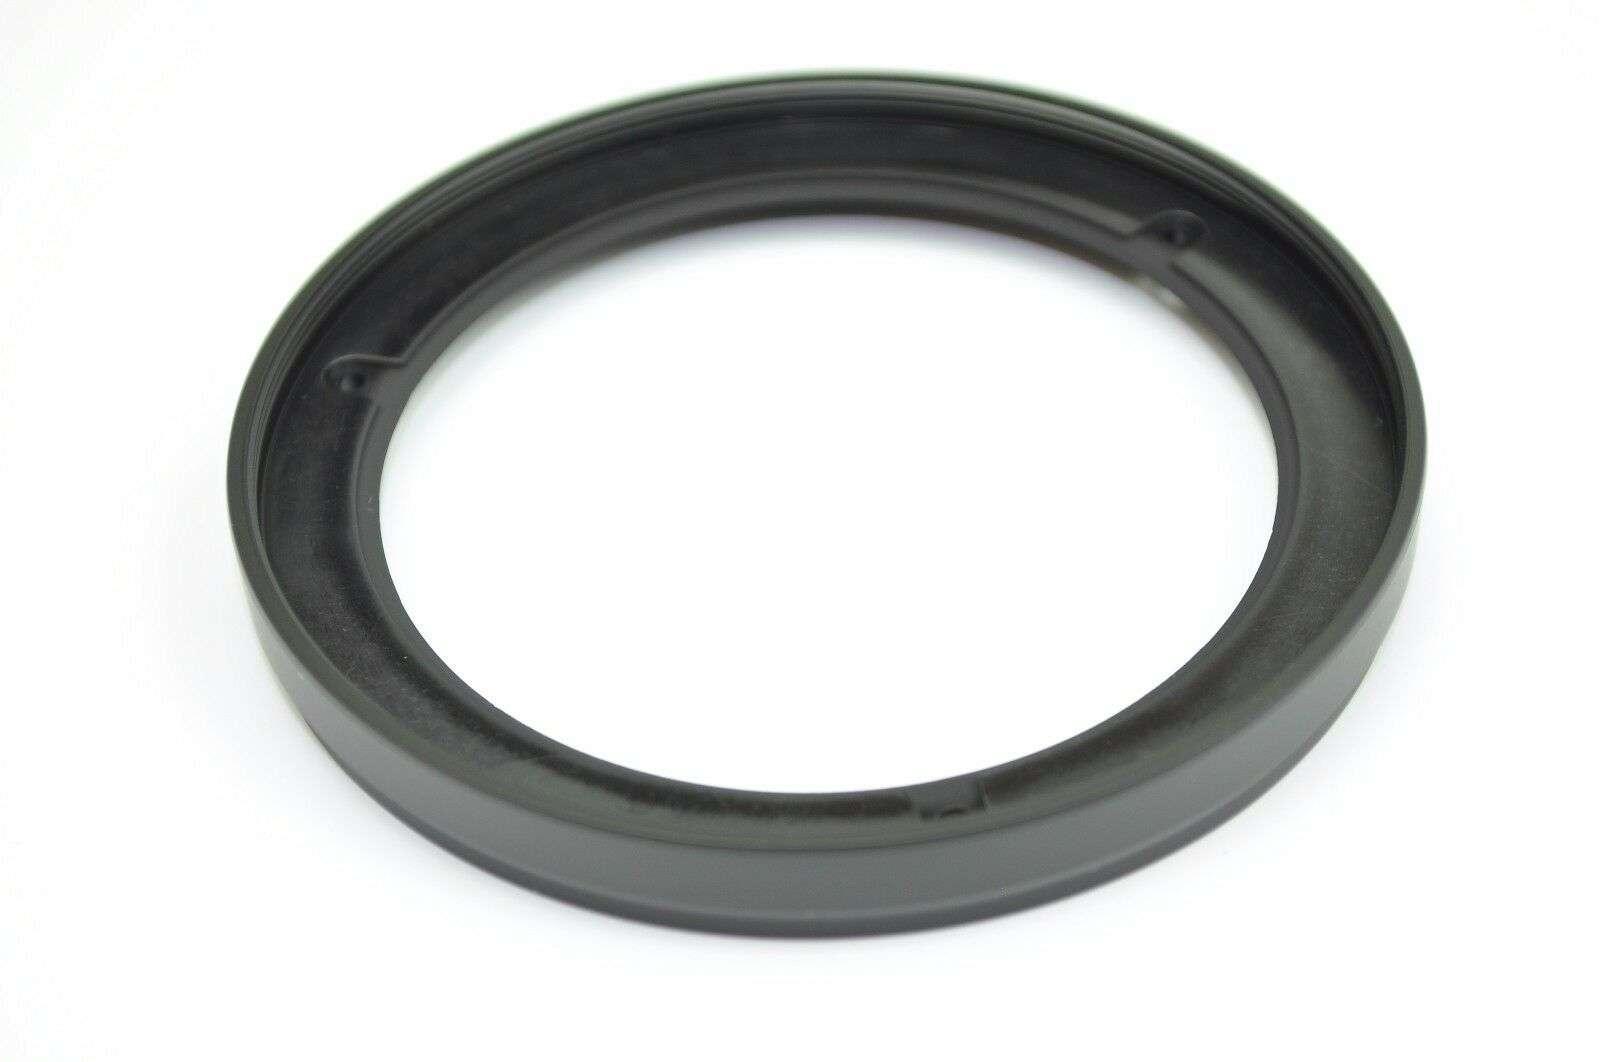 Nikon AF-S Nikkor 14-24mm f//2.8G ED Lens Screw Replacement Part 1K120-507 DH860